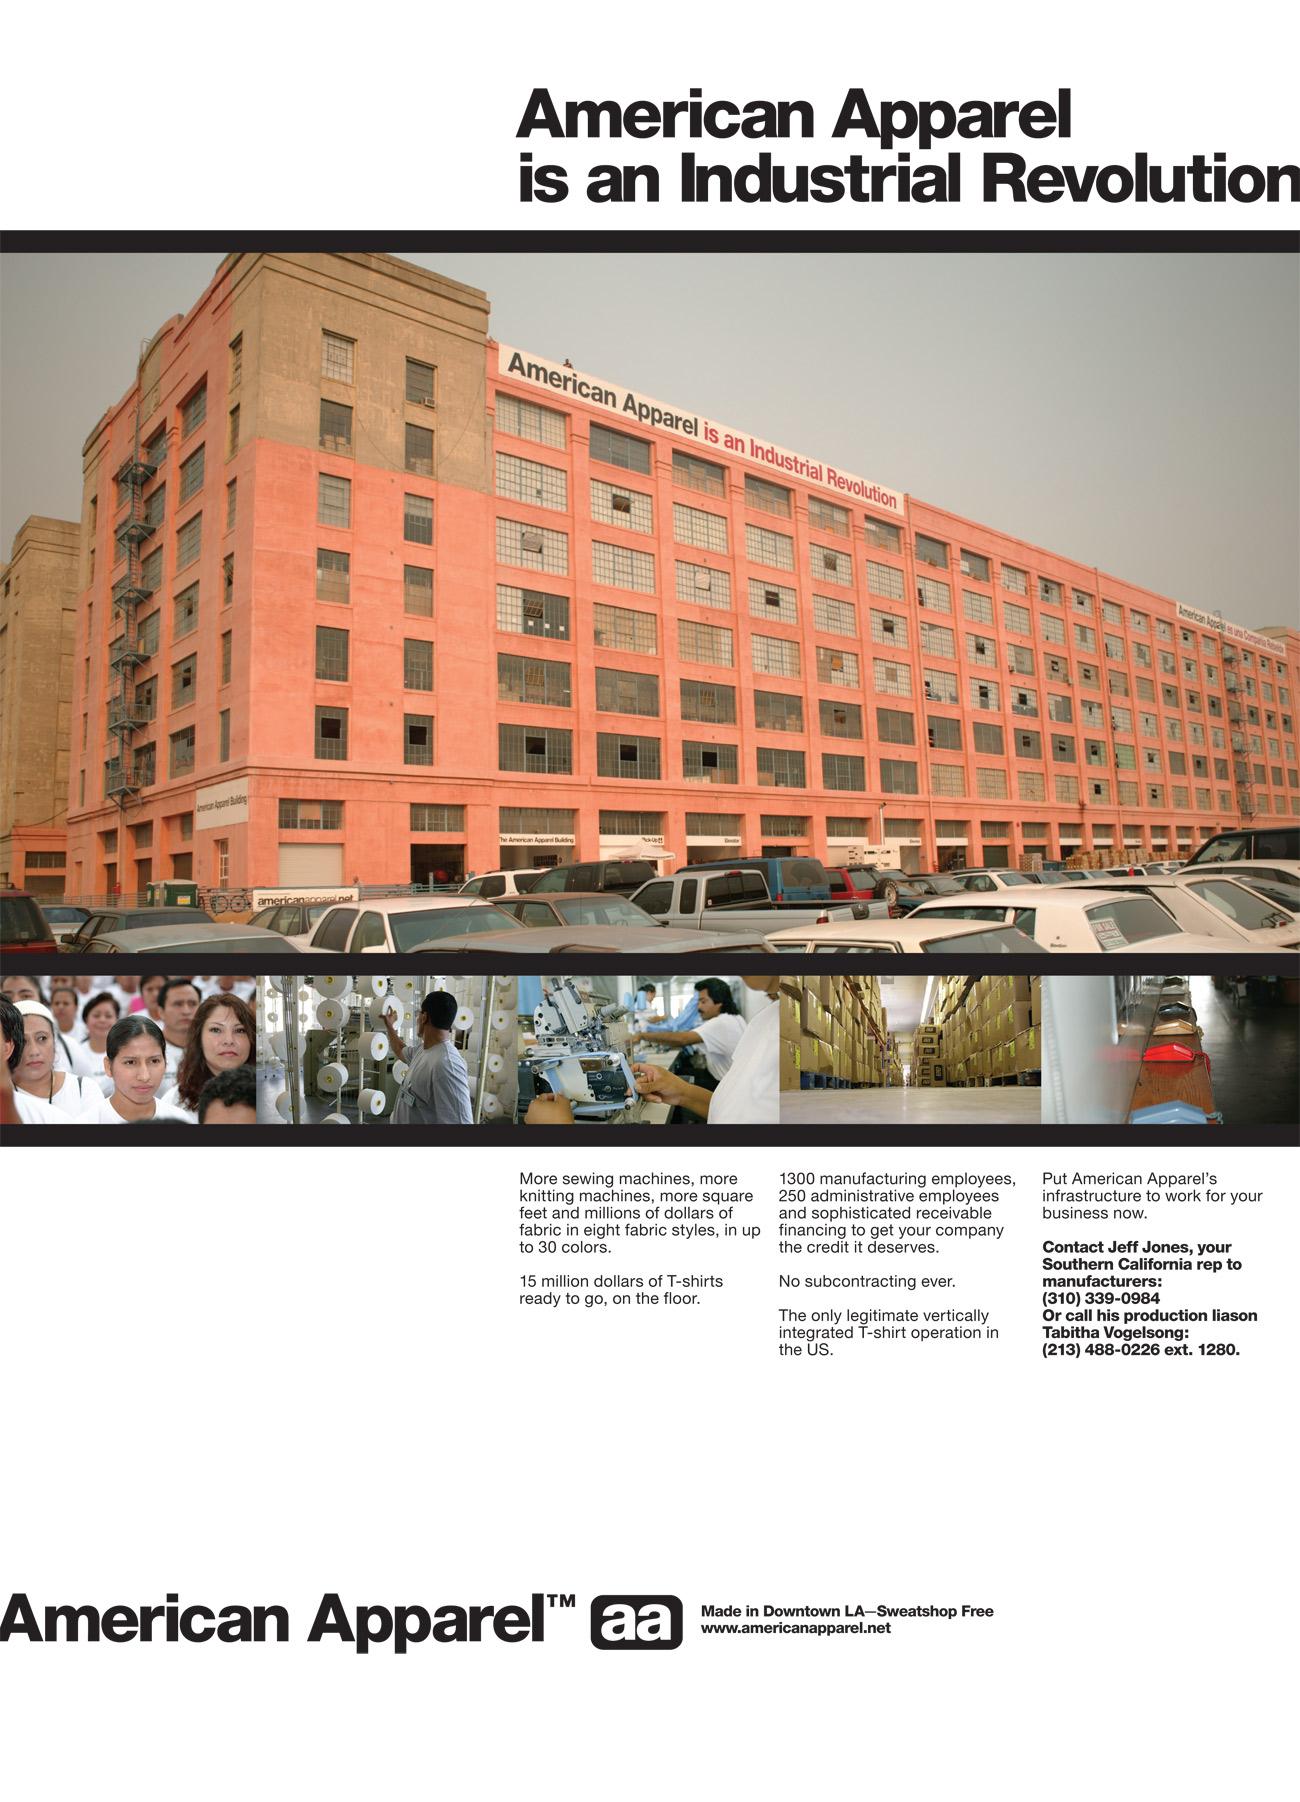 american-apparel-ad-LA-industrialrevolution-030304